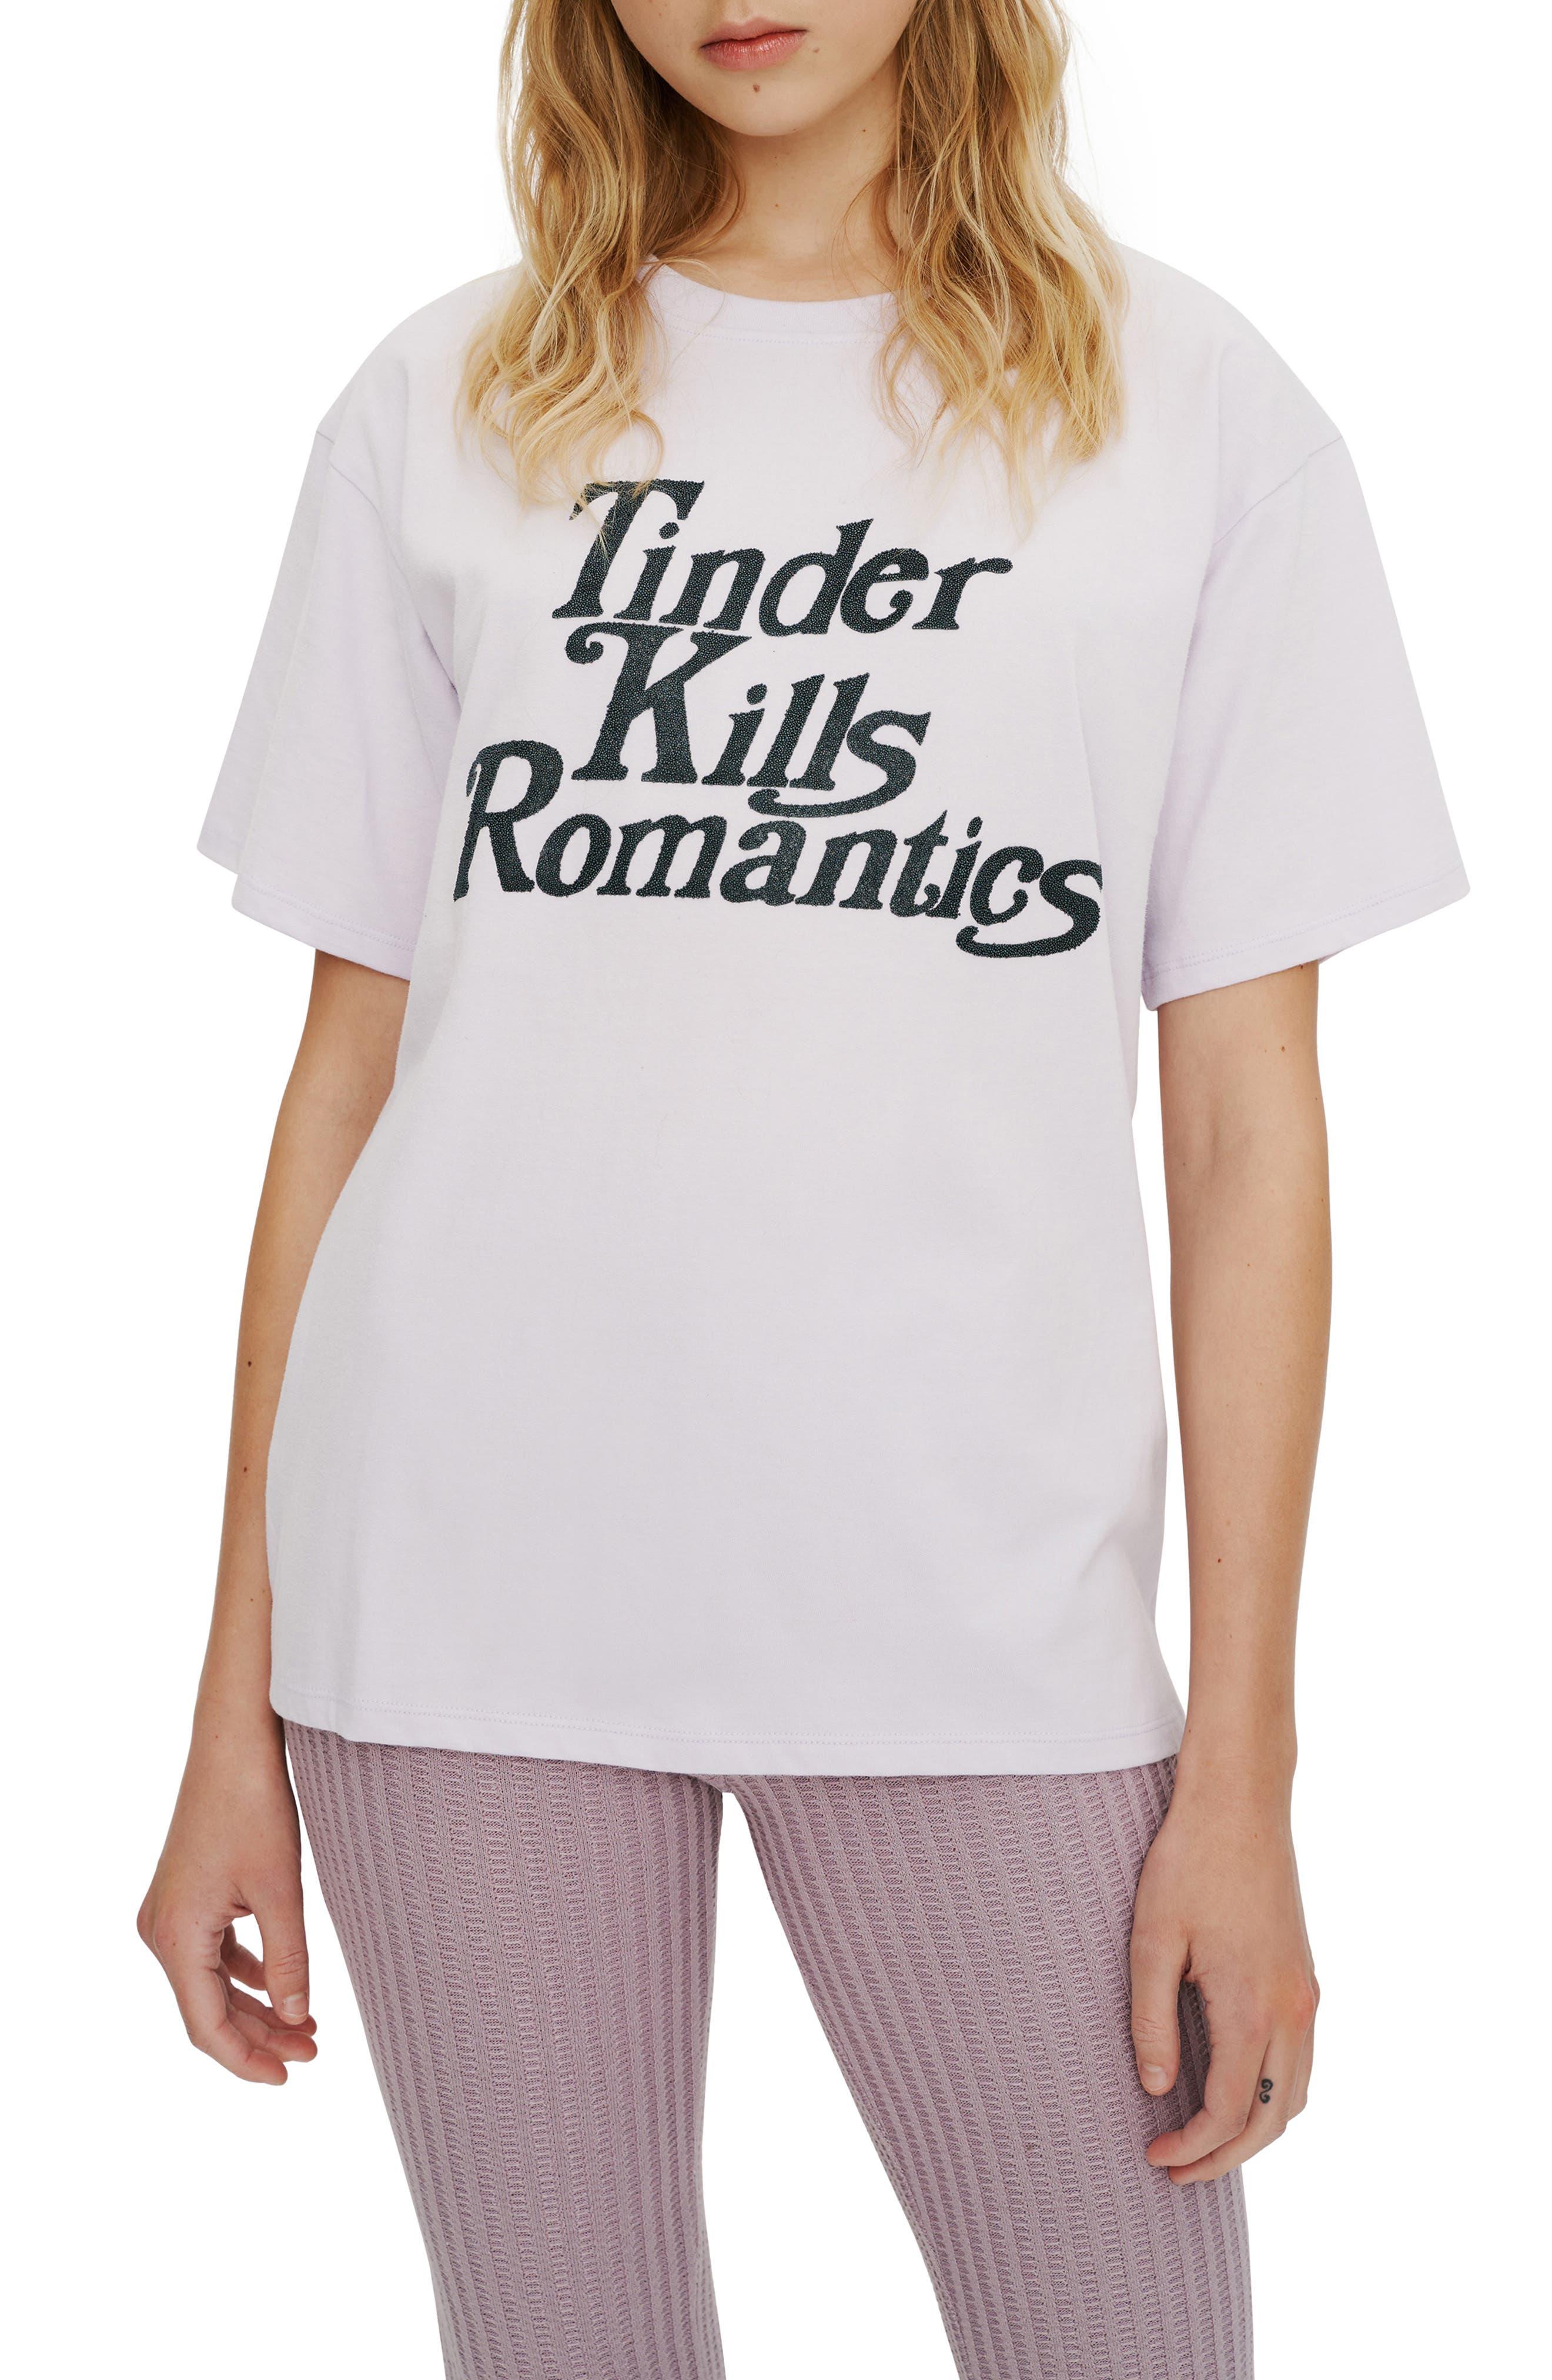 Tinder Kills Romantics Graphic Tee